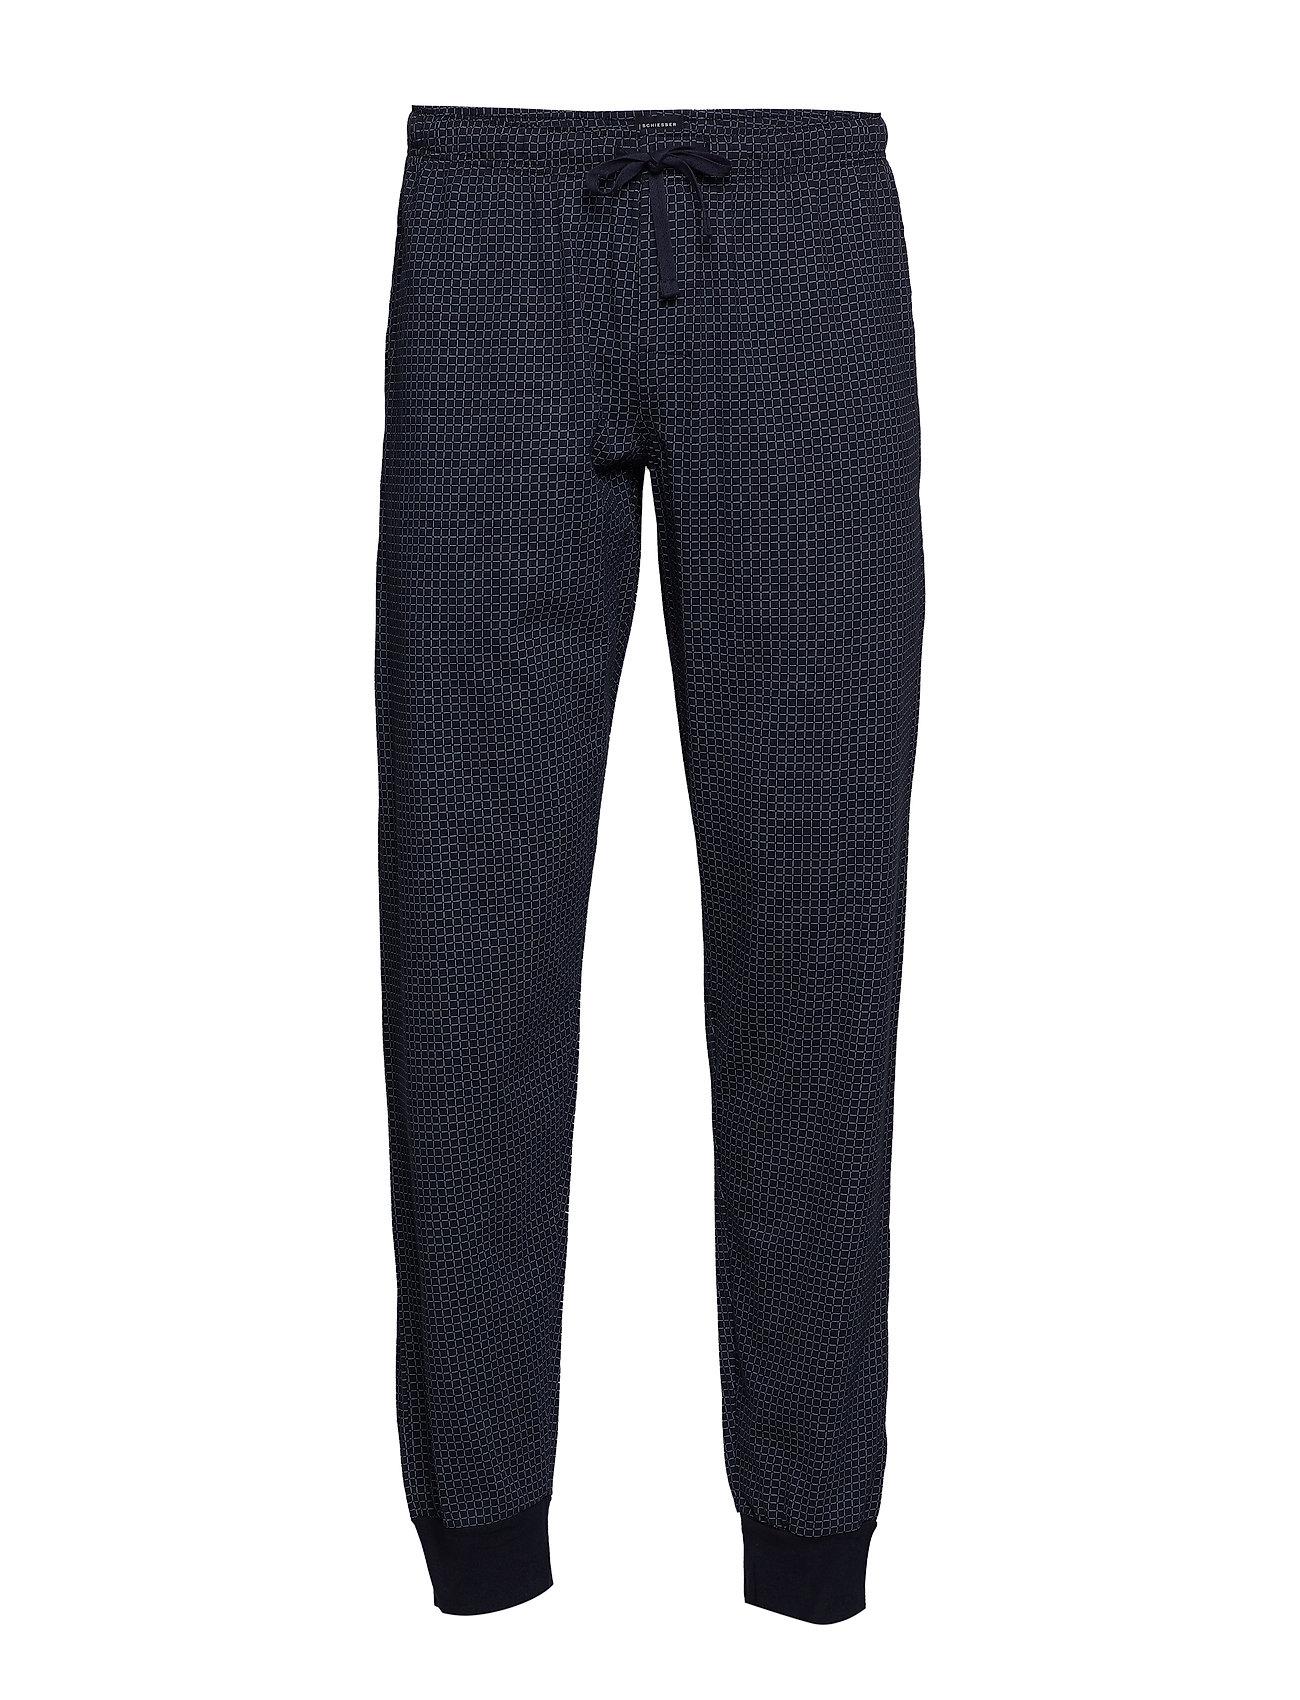 Image of Long Pants Hyggebukser Blå Schiesser (3134854653)